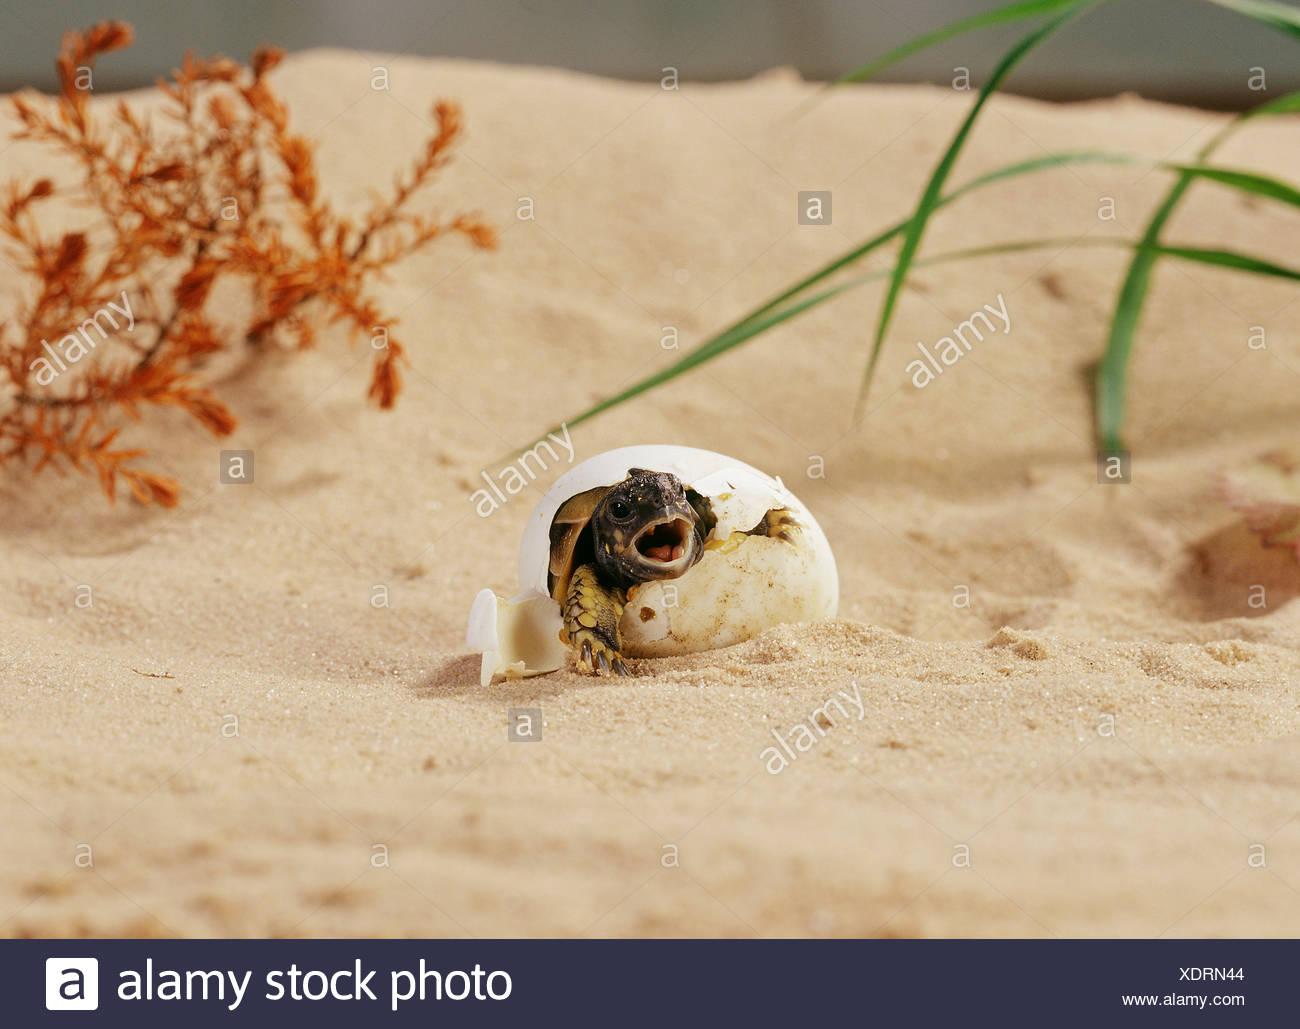 Hermann's Tortoise (Testudo hermanni). Hatchling hatching - Stock Image